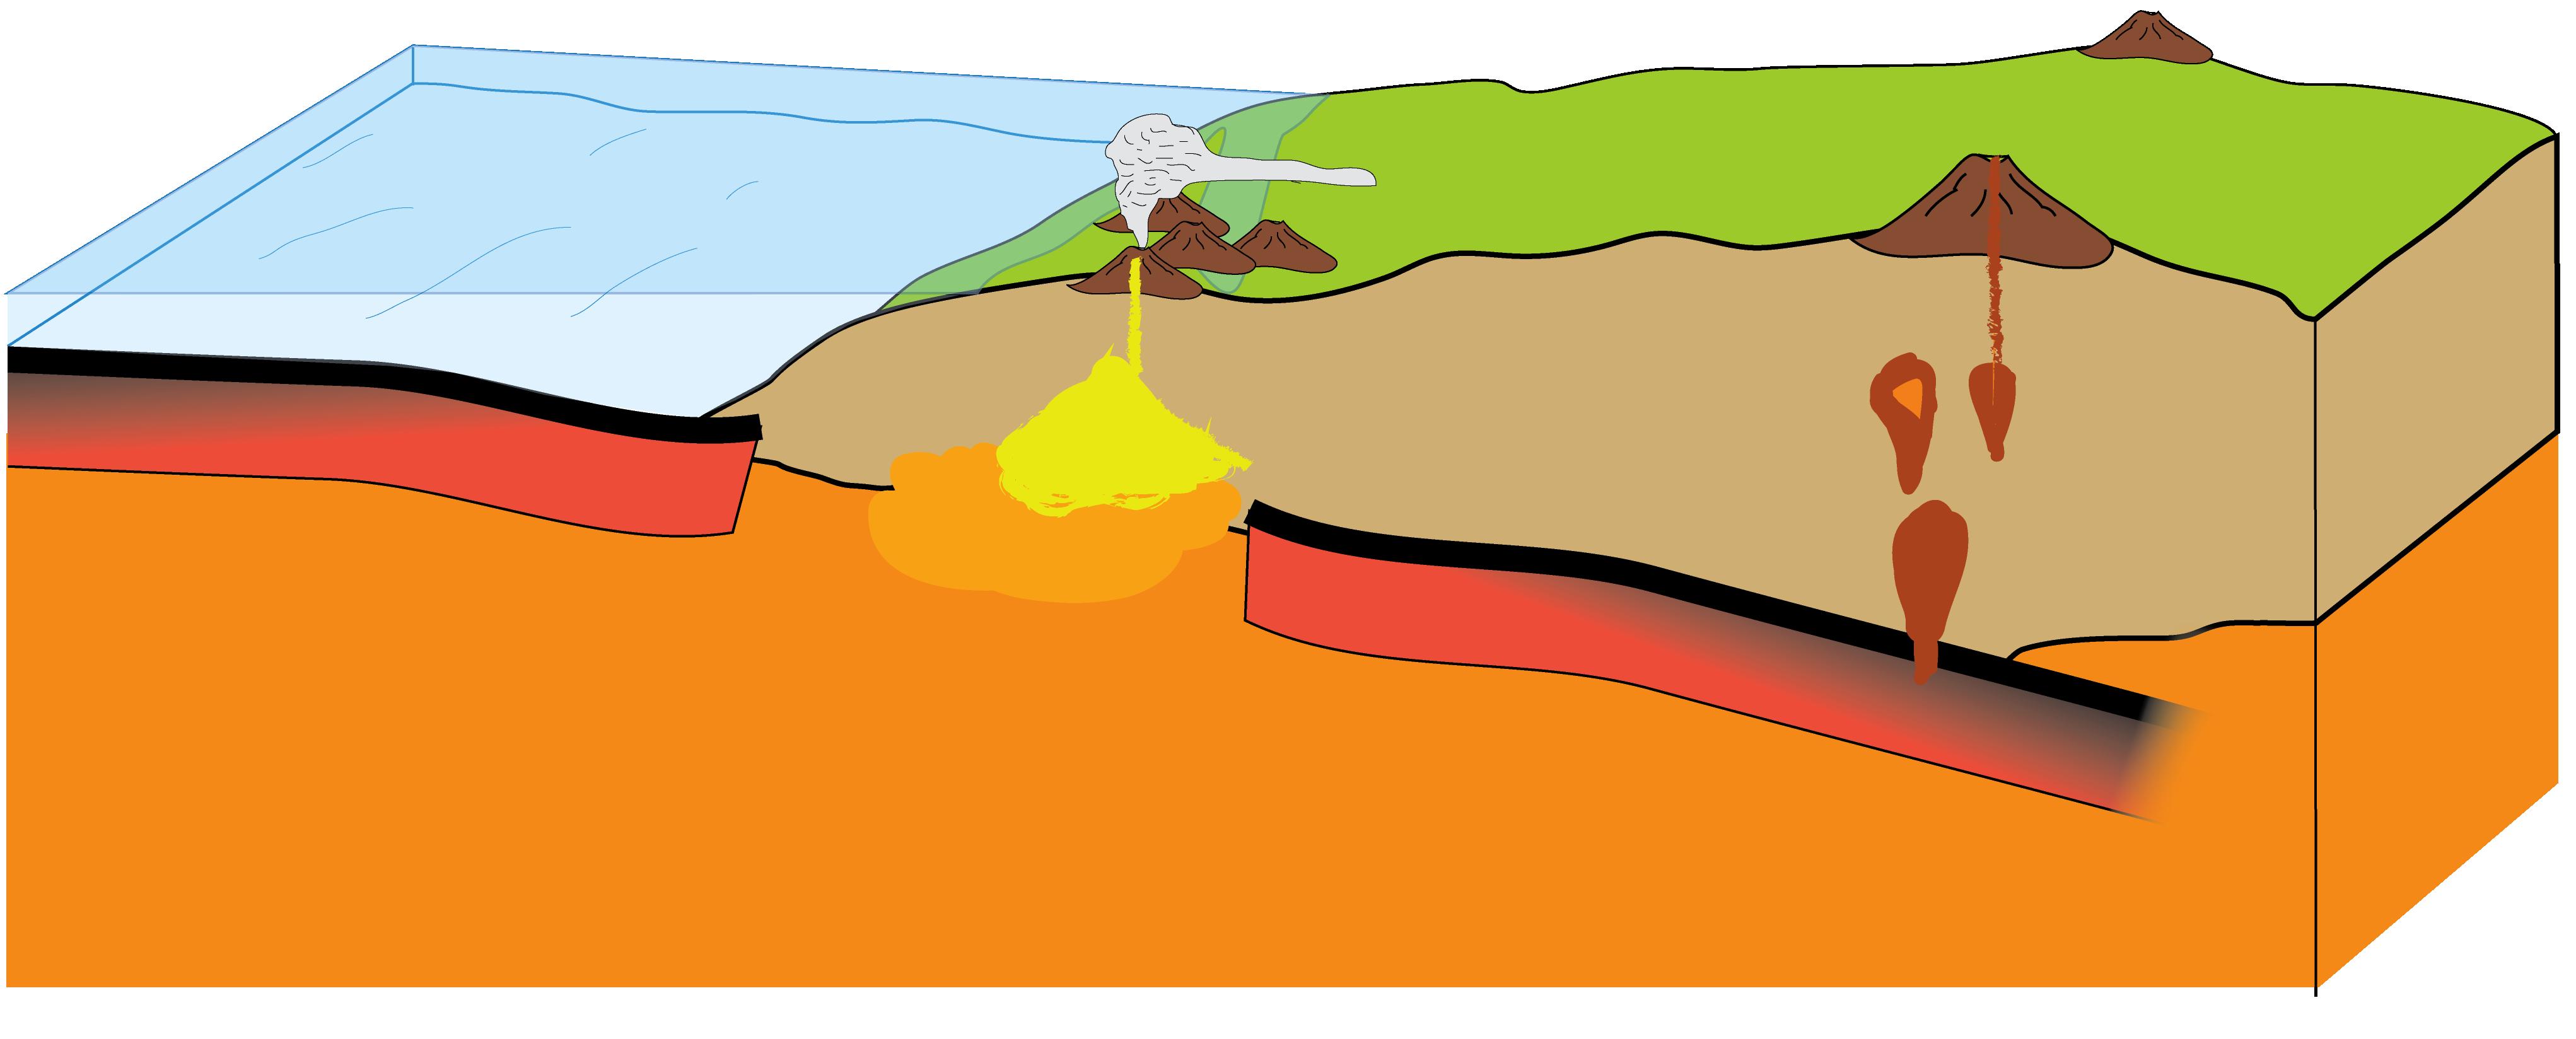 Earthquake clipart san andreas fault. Geology pinnacles national park